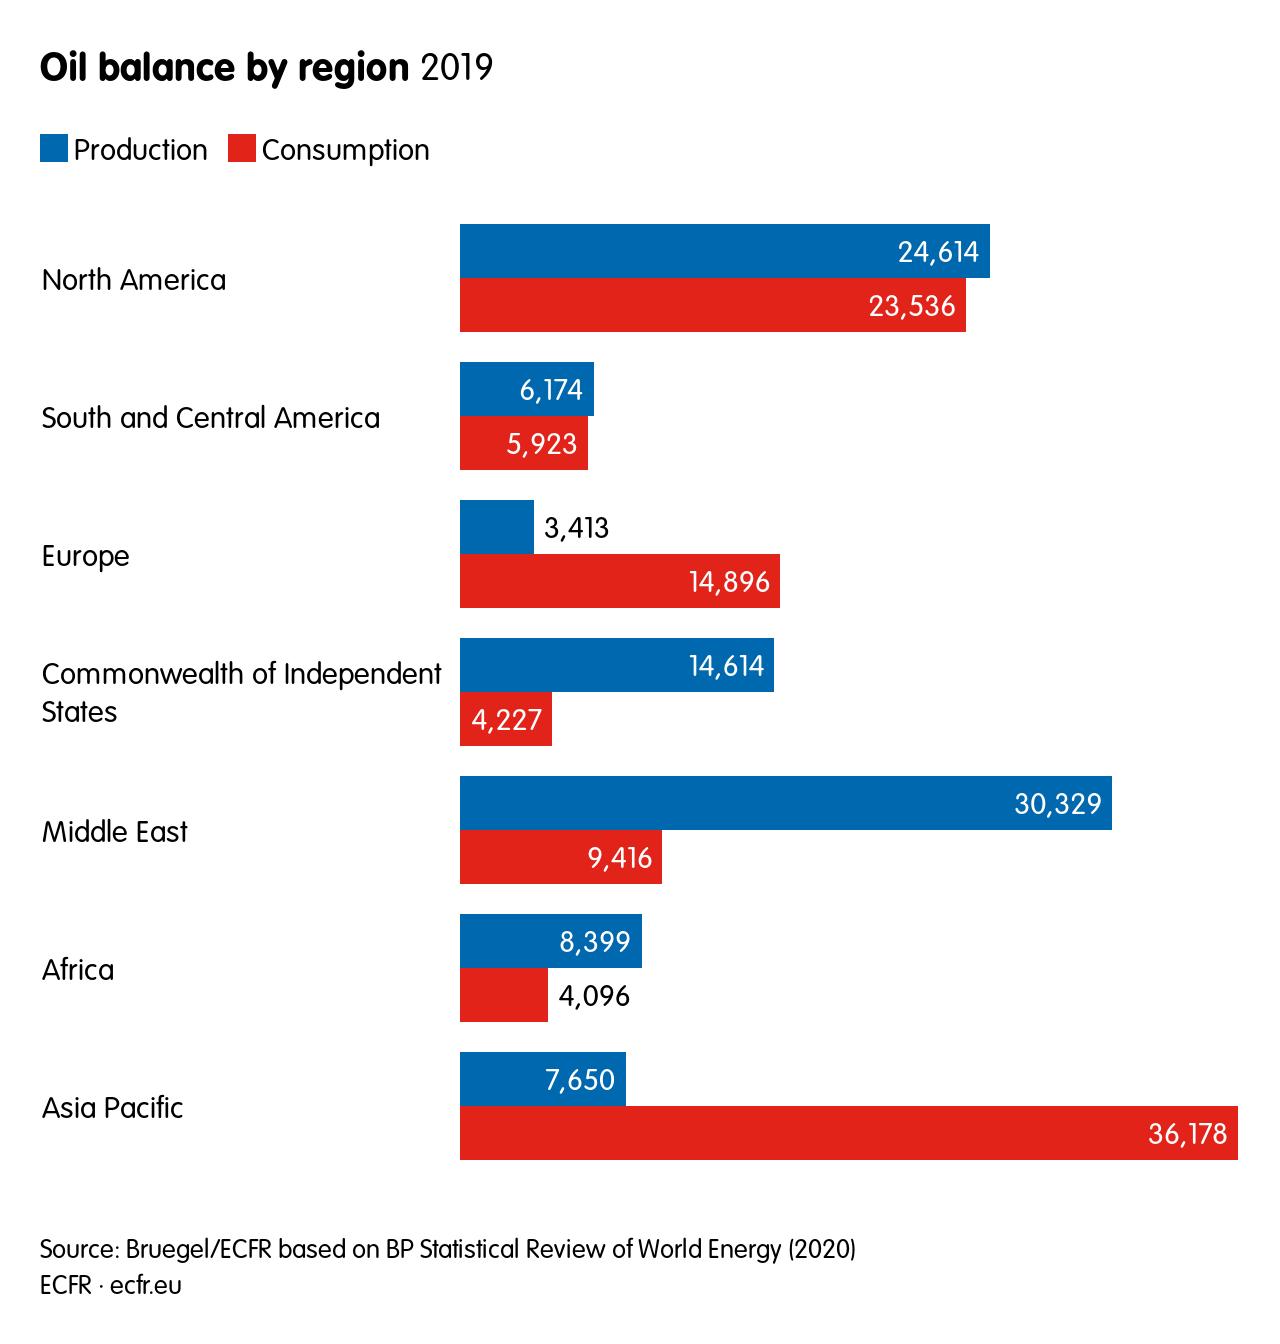 Oil balance by region